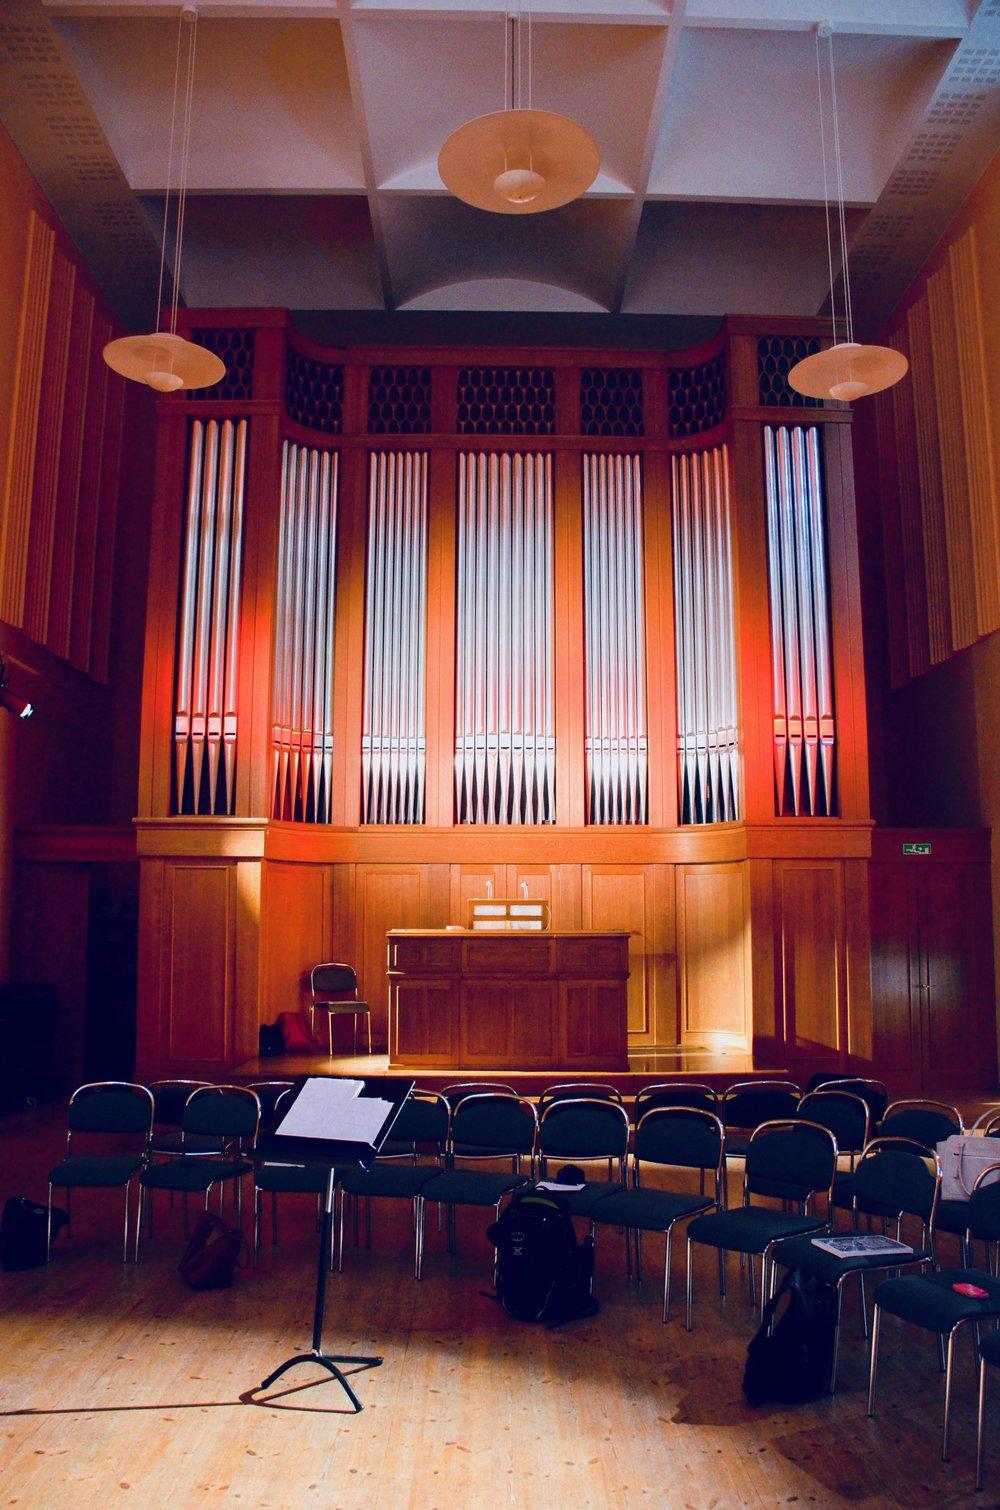 The 1998 French romantic organ in Göteborg University.